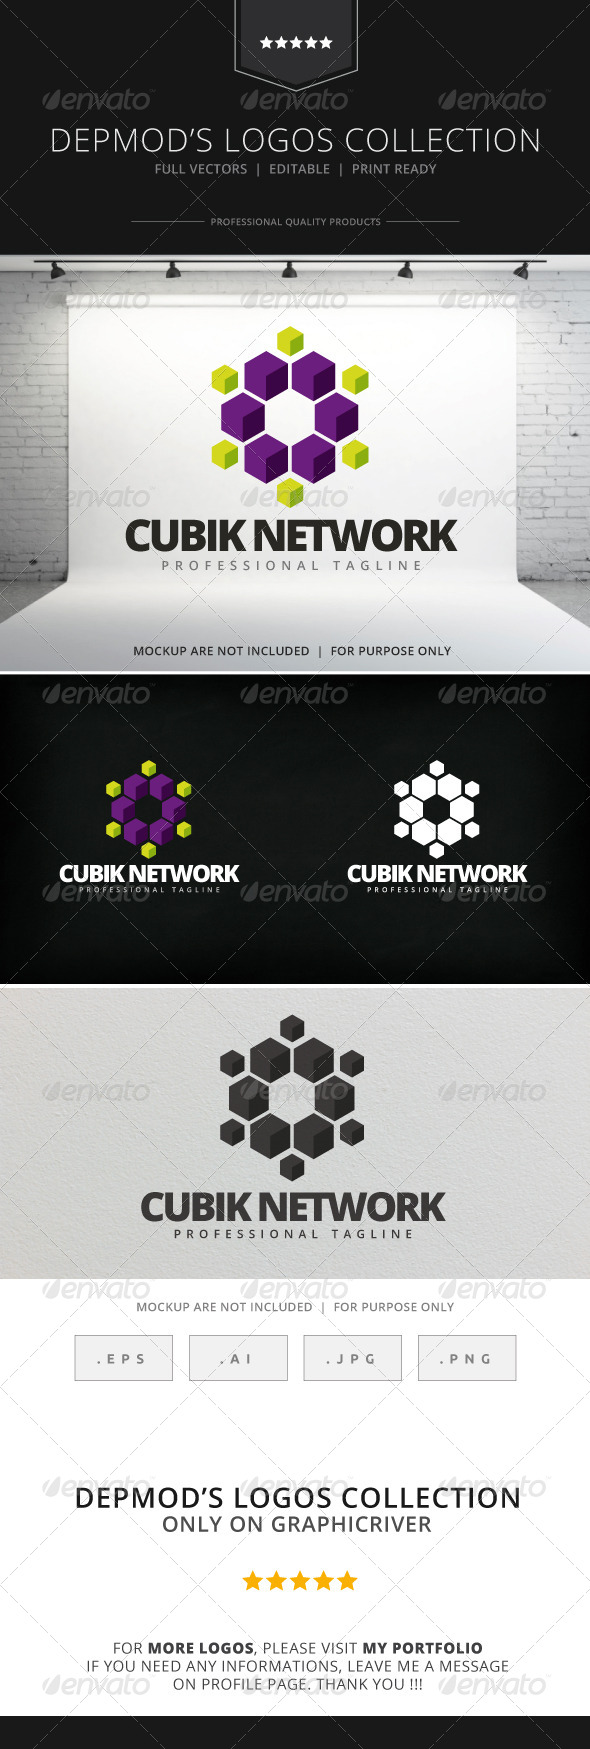 GraphicRiver Cubik Network Logo 7930518